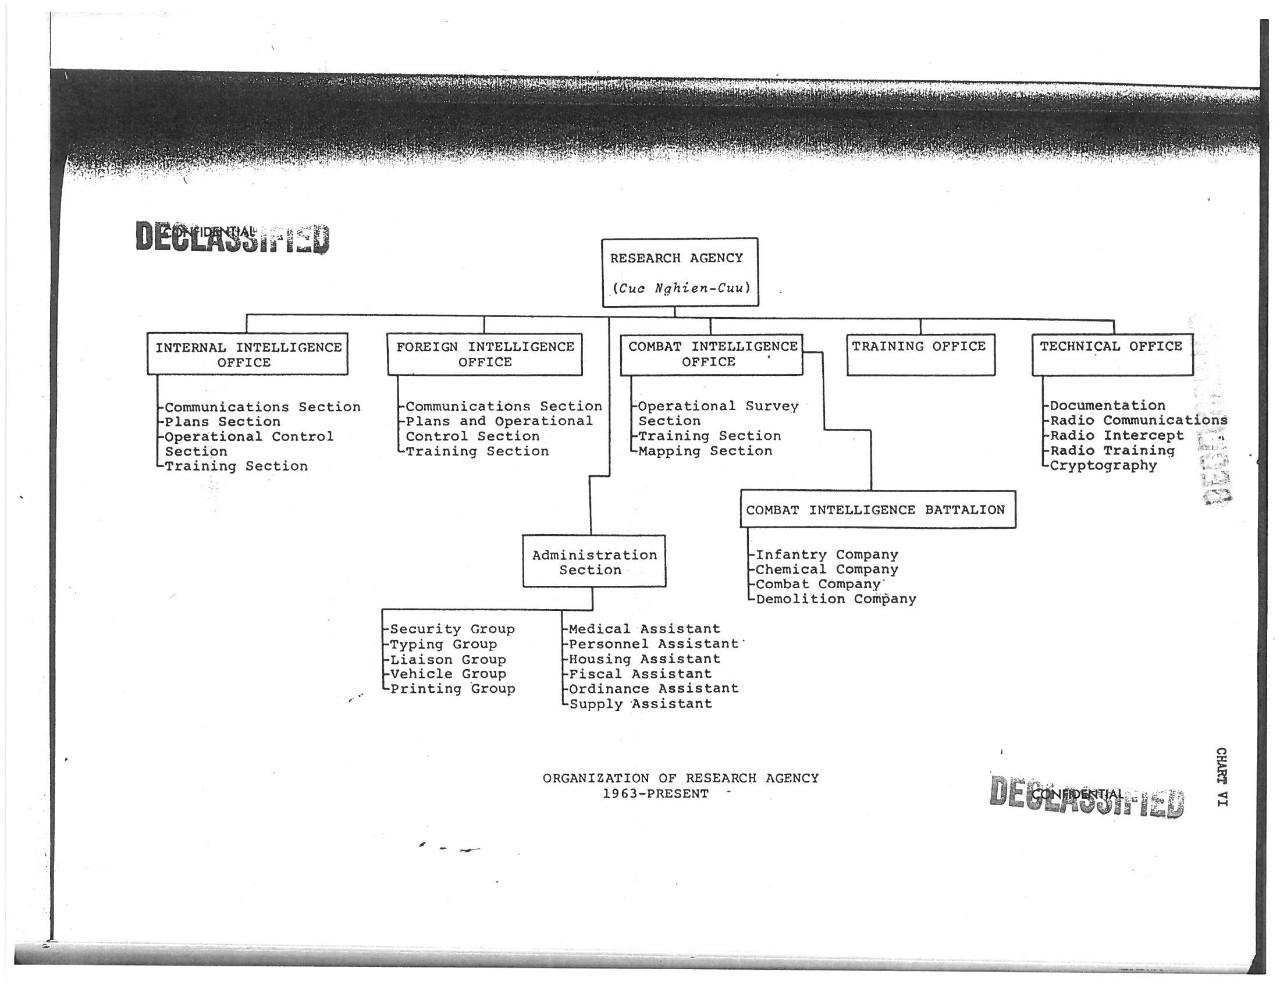 The DRVN Strategic Intelligence Service